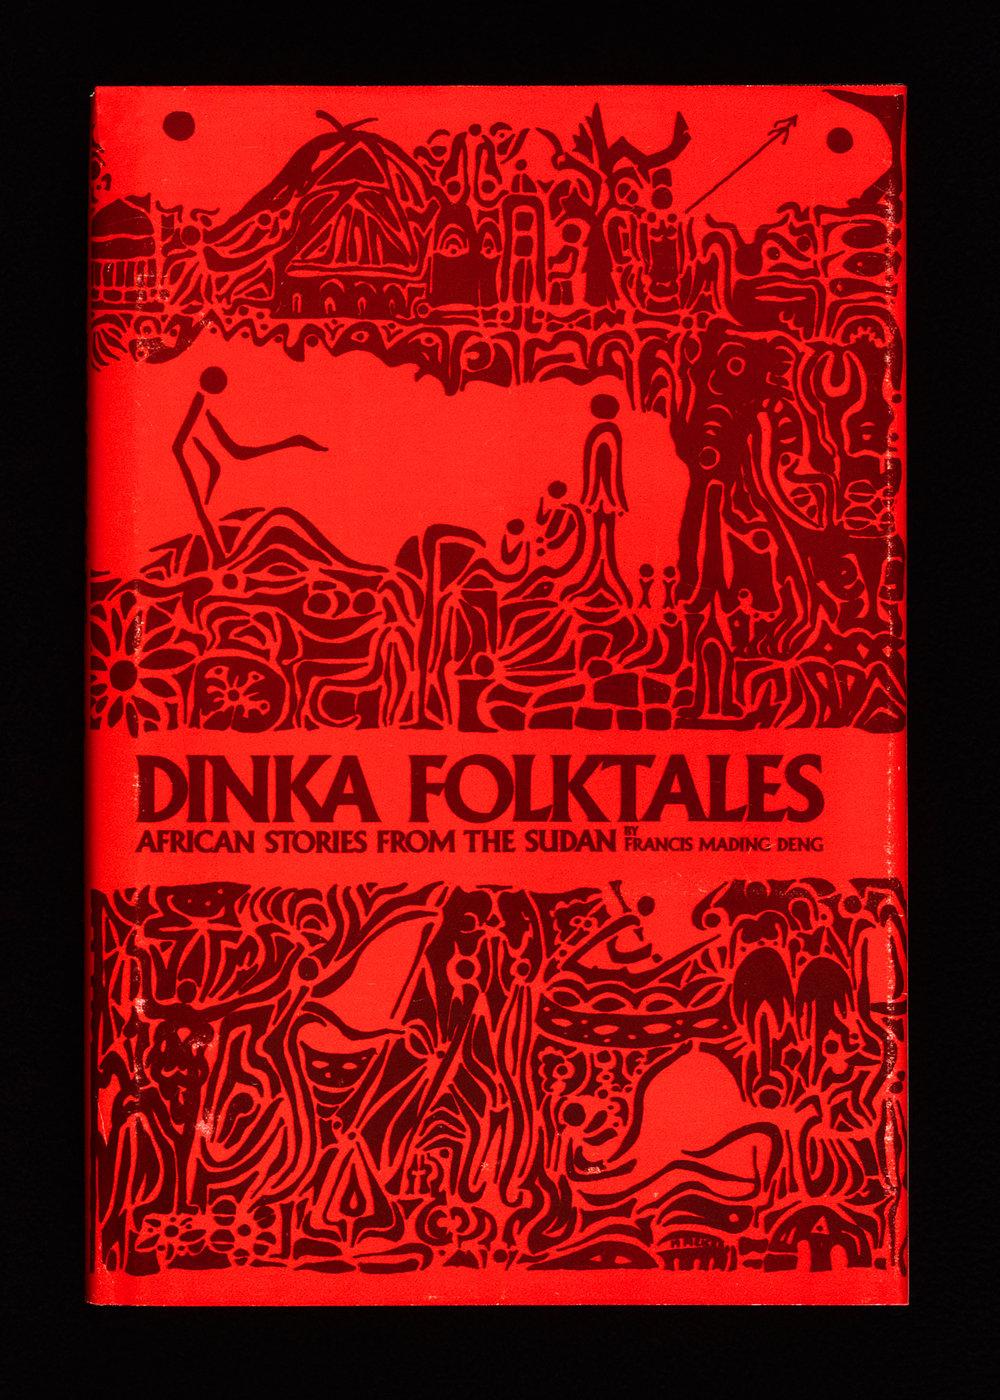 """DINKA BEDTIME STORIES"" (book cover)"